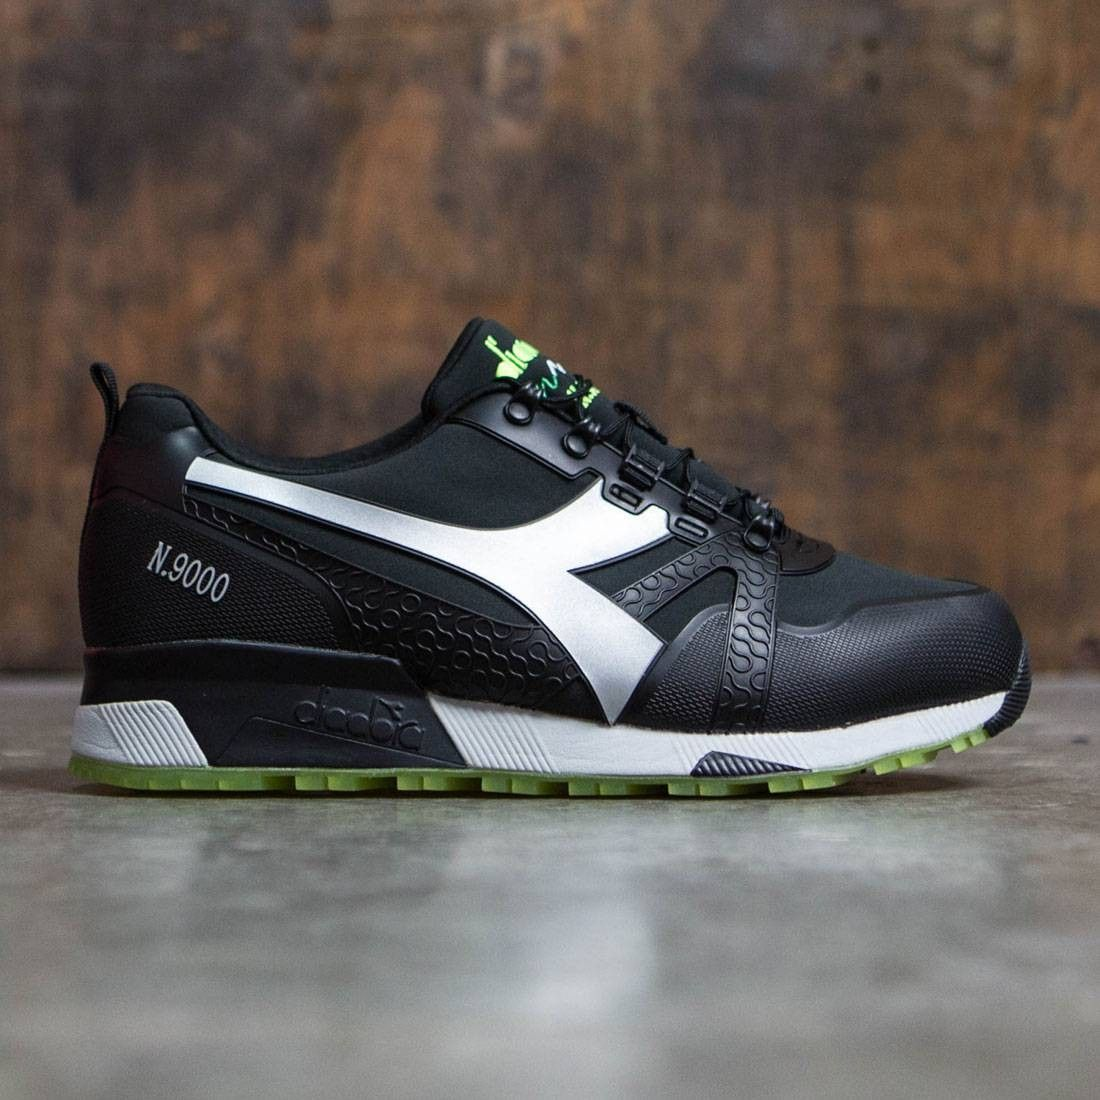 8a712b7d6f Diadora Men N9000 WNT - Bright (black / green / silver) | Sports ...